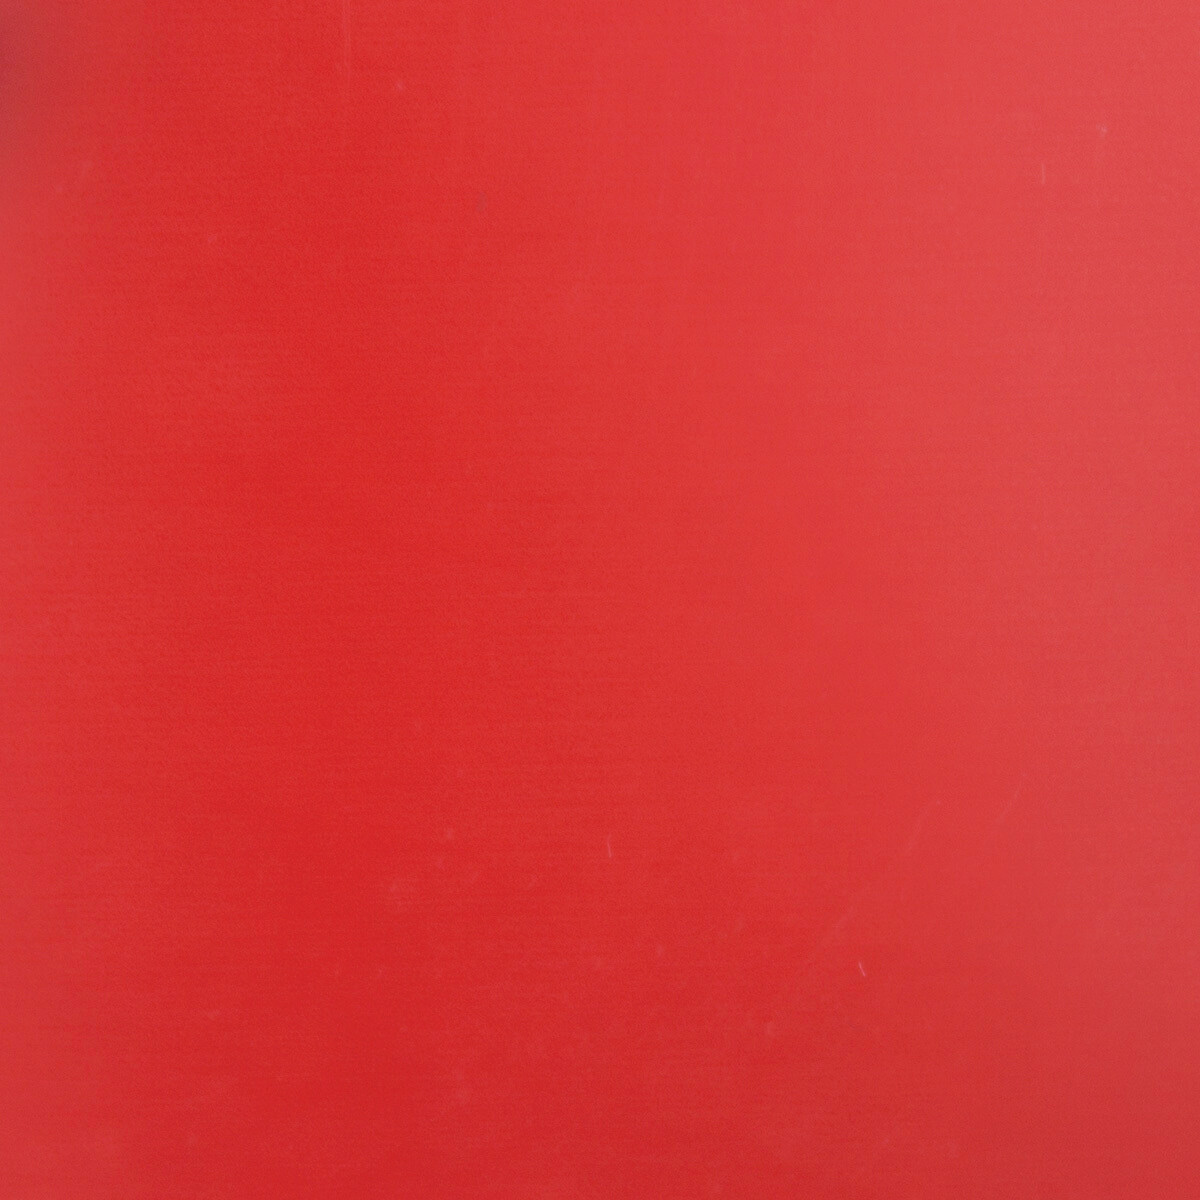 Vivid Red Hotmark Revolution HTV - Large Roll